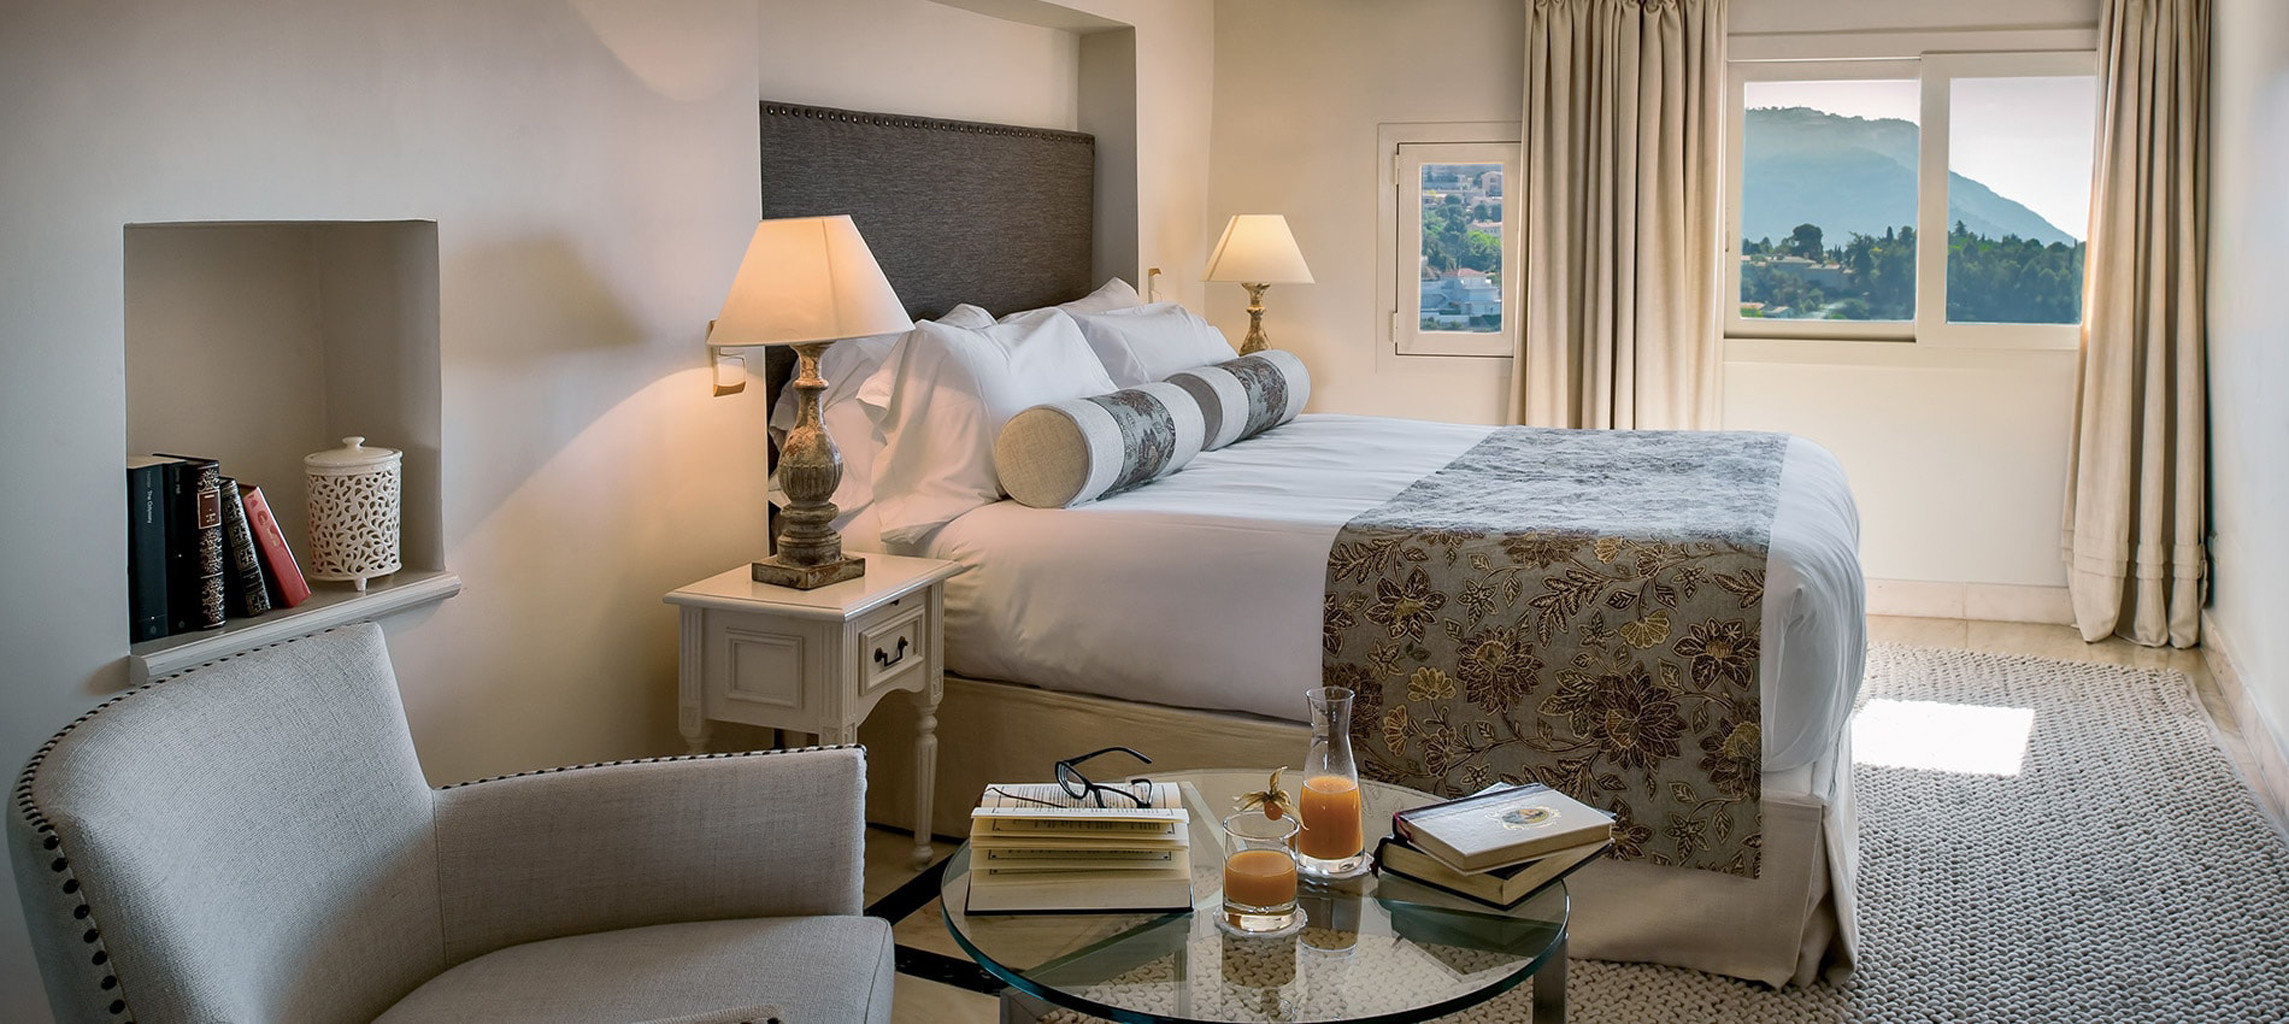 living room property home Suite cottage condominium Bedroom